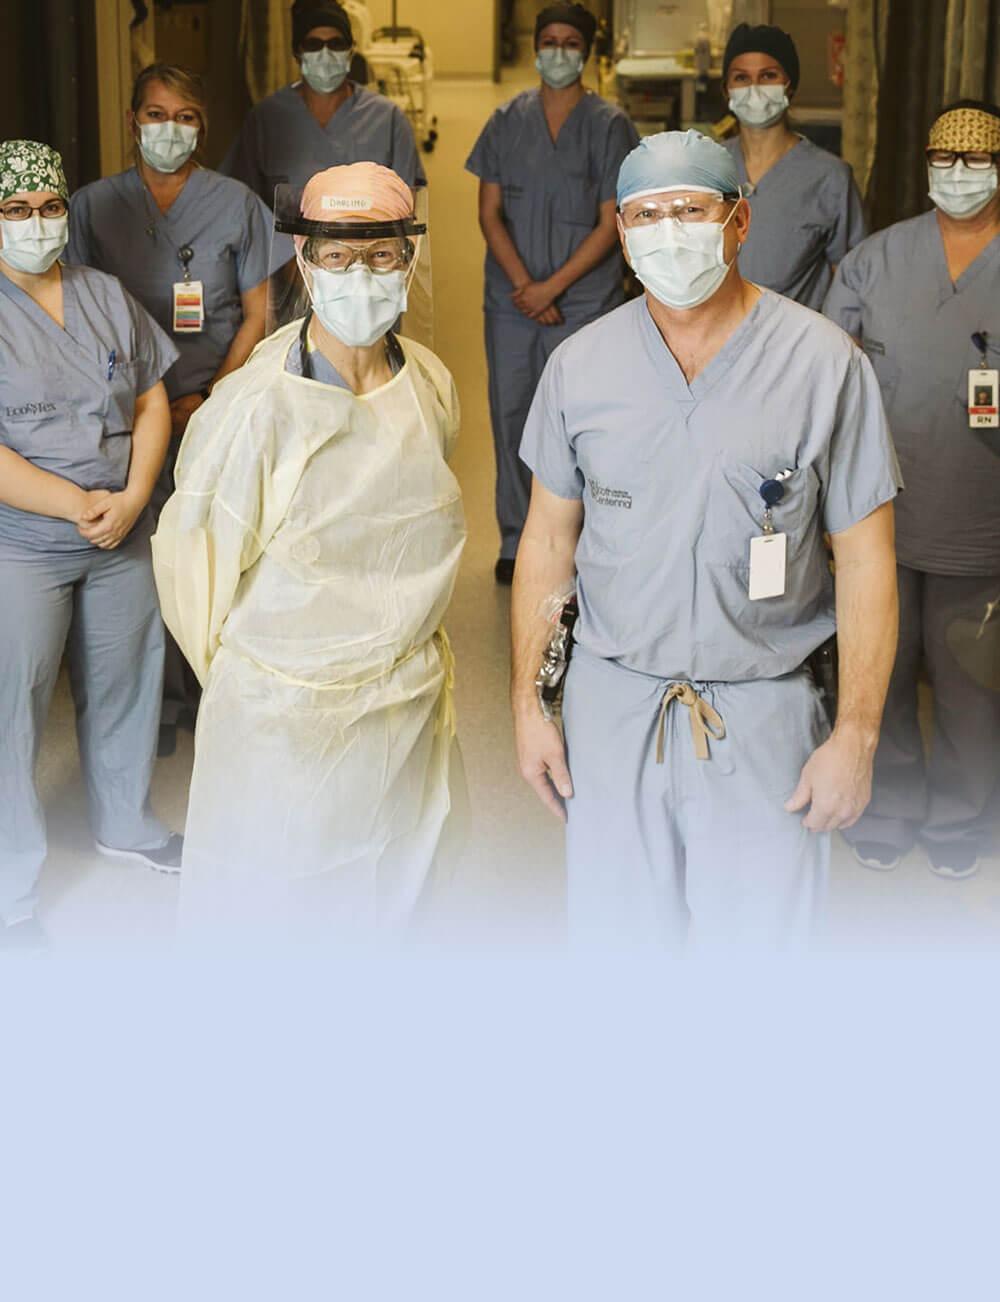 Hospital staff standing in hallway wearing masks